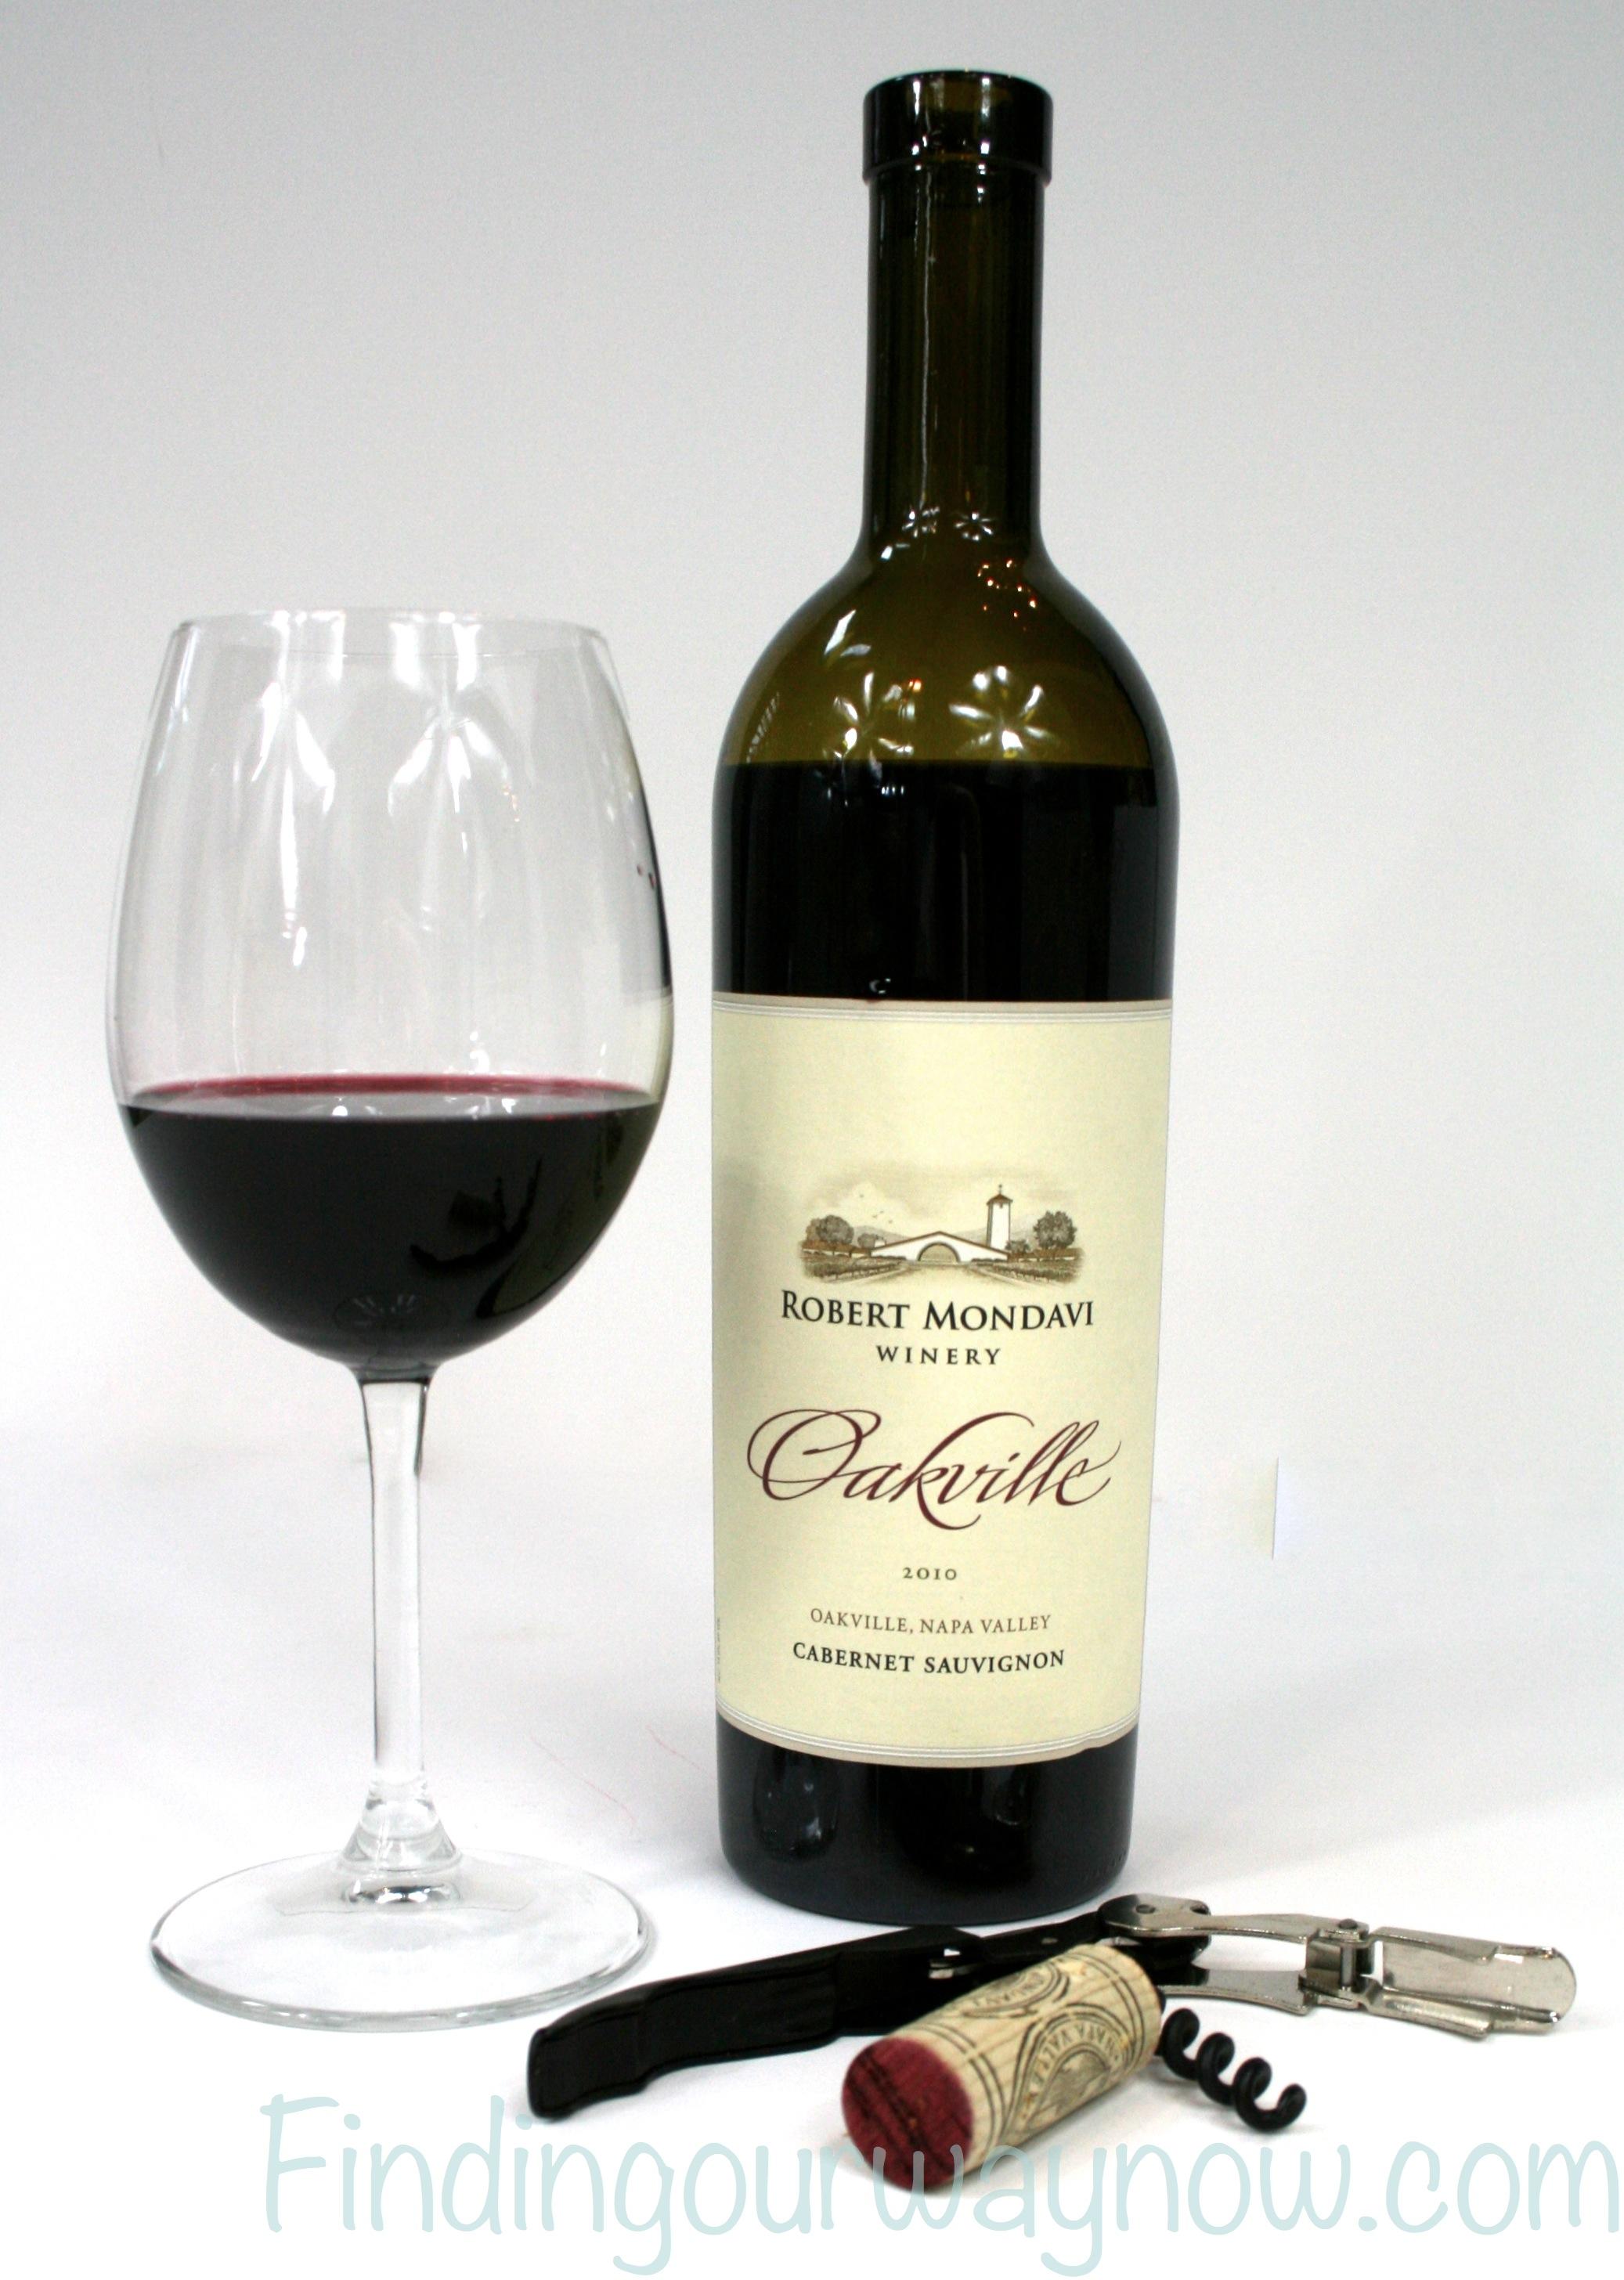 Robert Mondavi Oakville Cabernet Sauvignon 2010 Wine